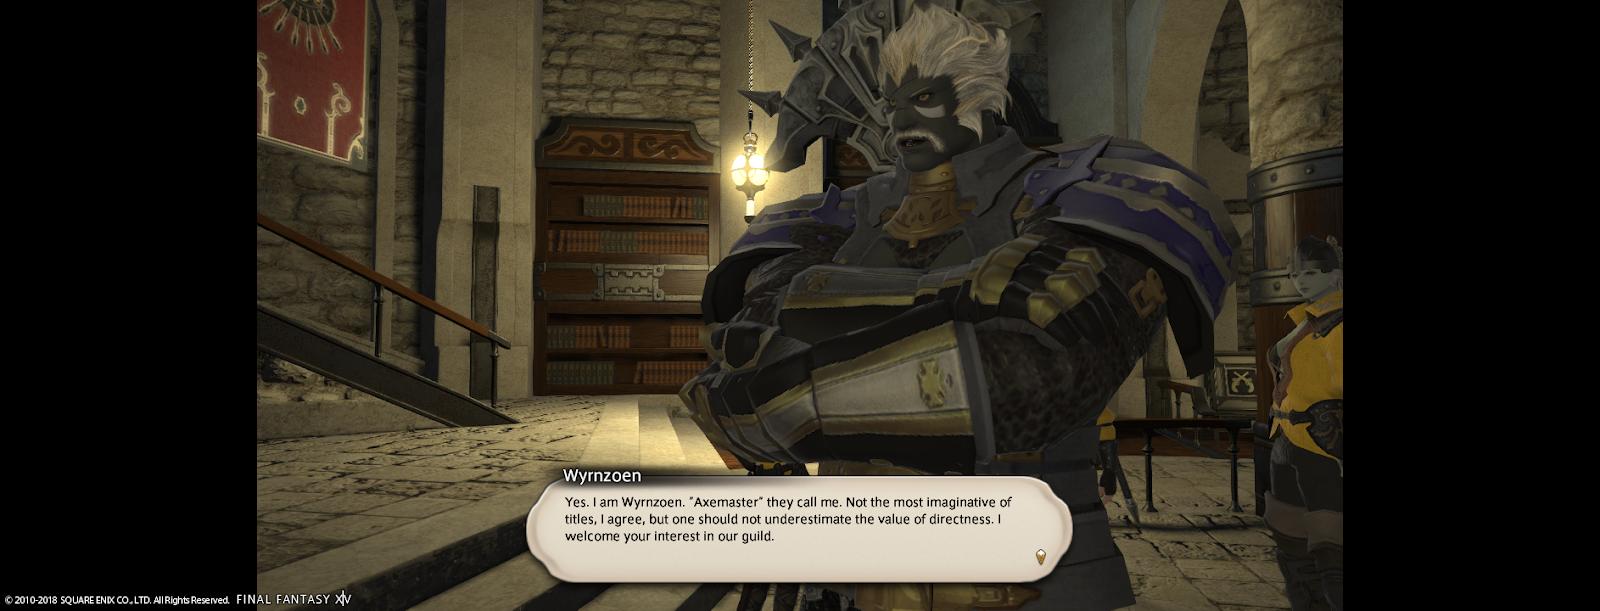 Pira Pira Peri Pera's Final Fantasy XIV Blog